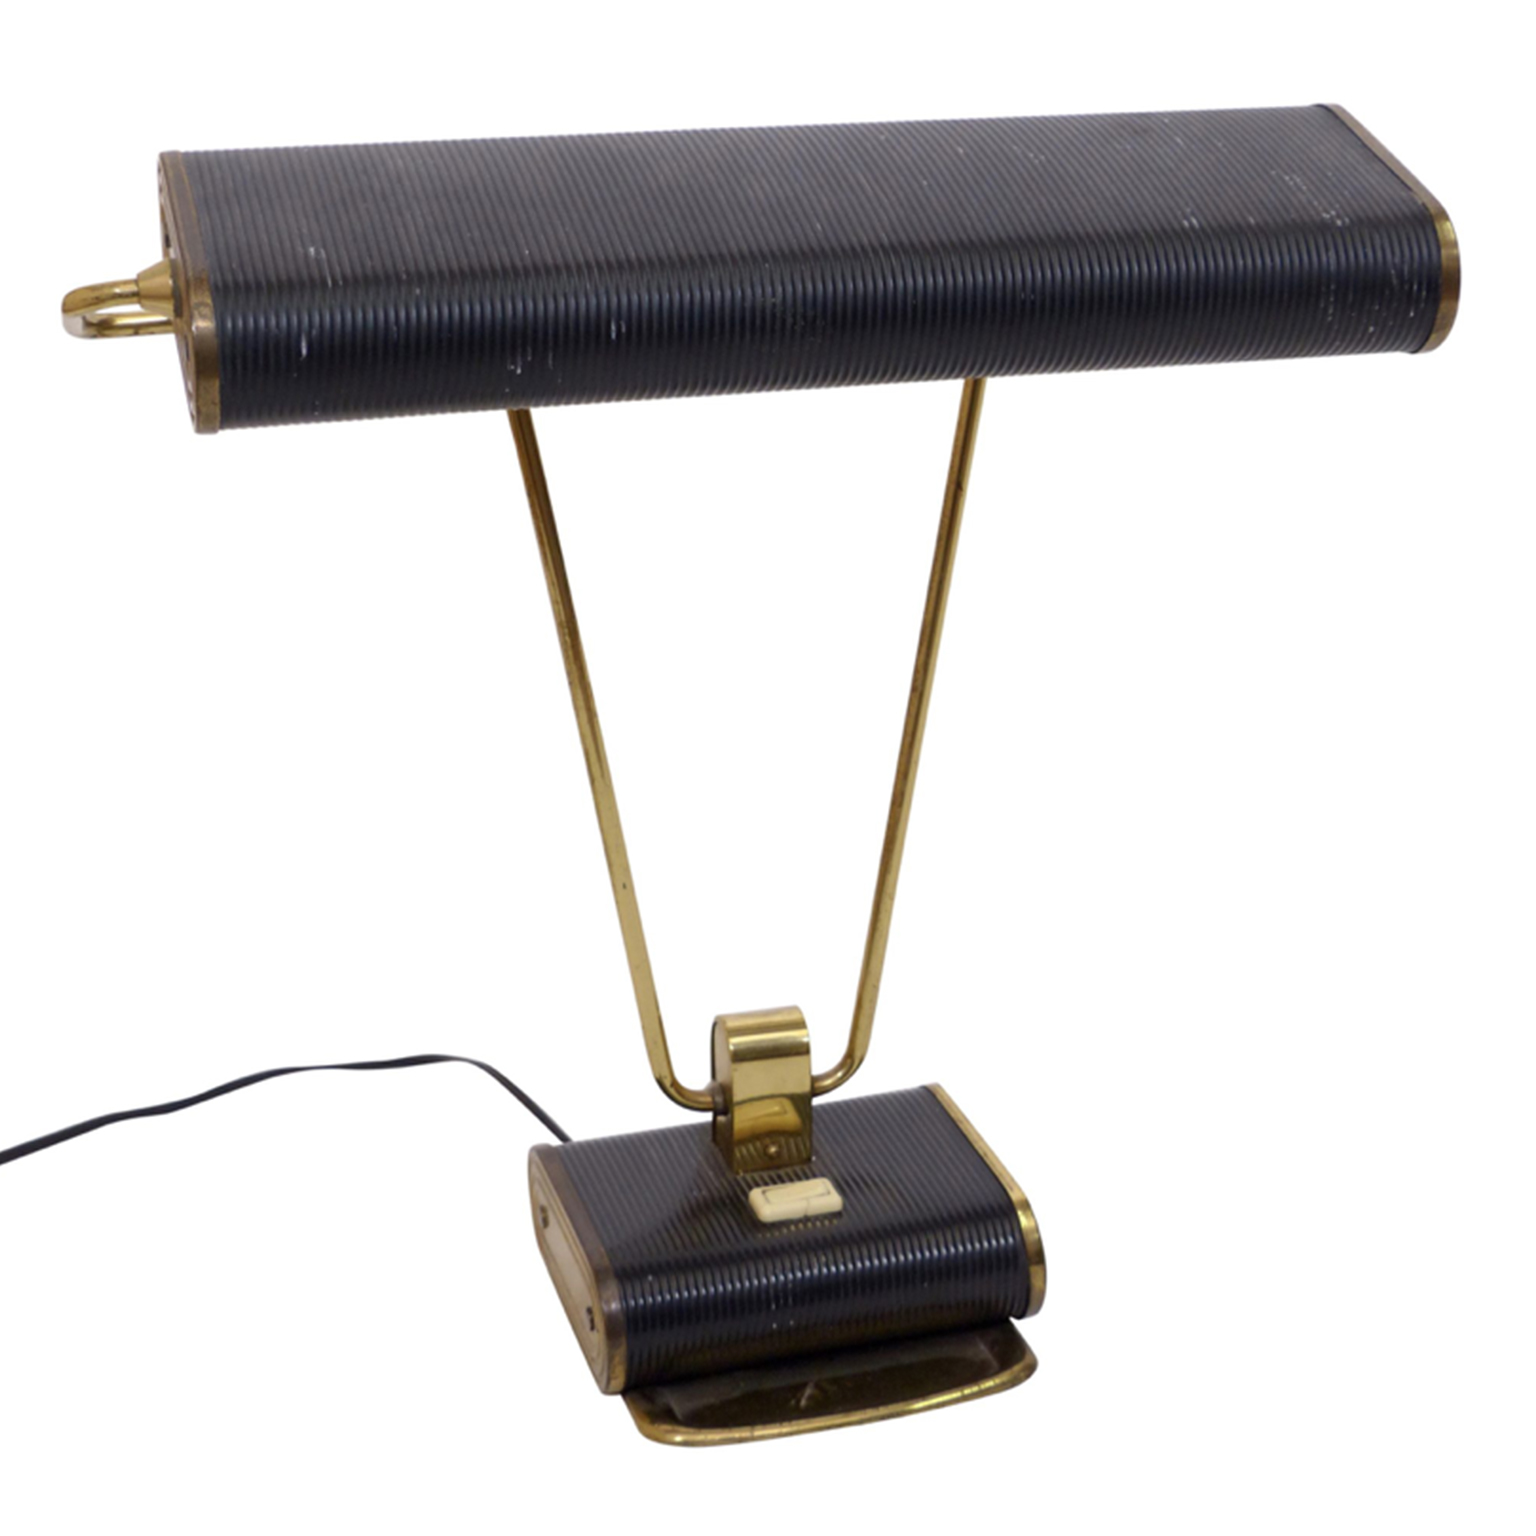 Black Art Deco desk lamp by Eileen Gray, with brass hardware.